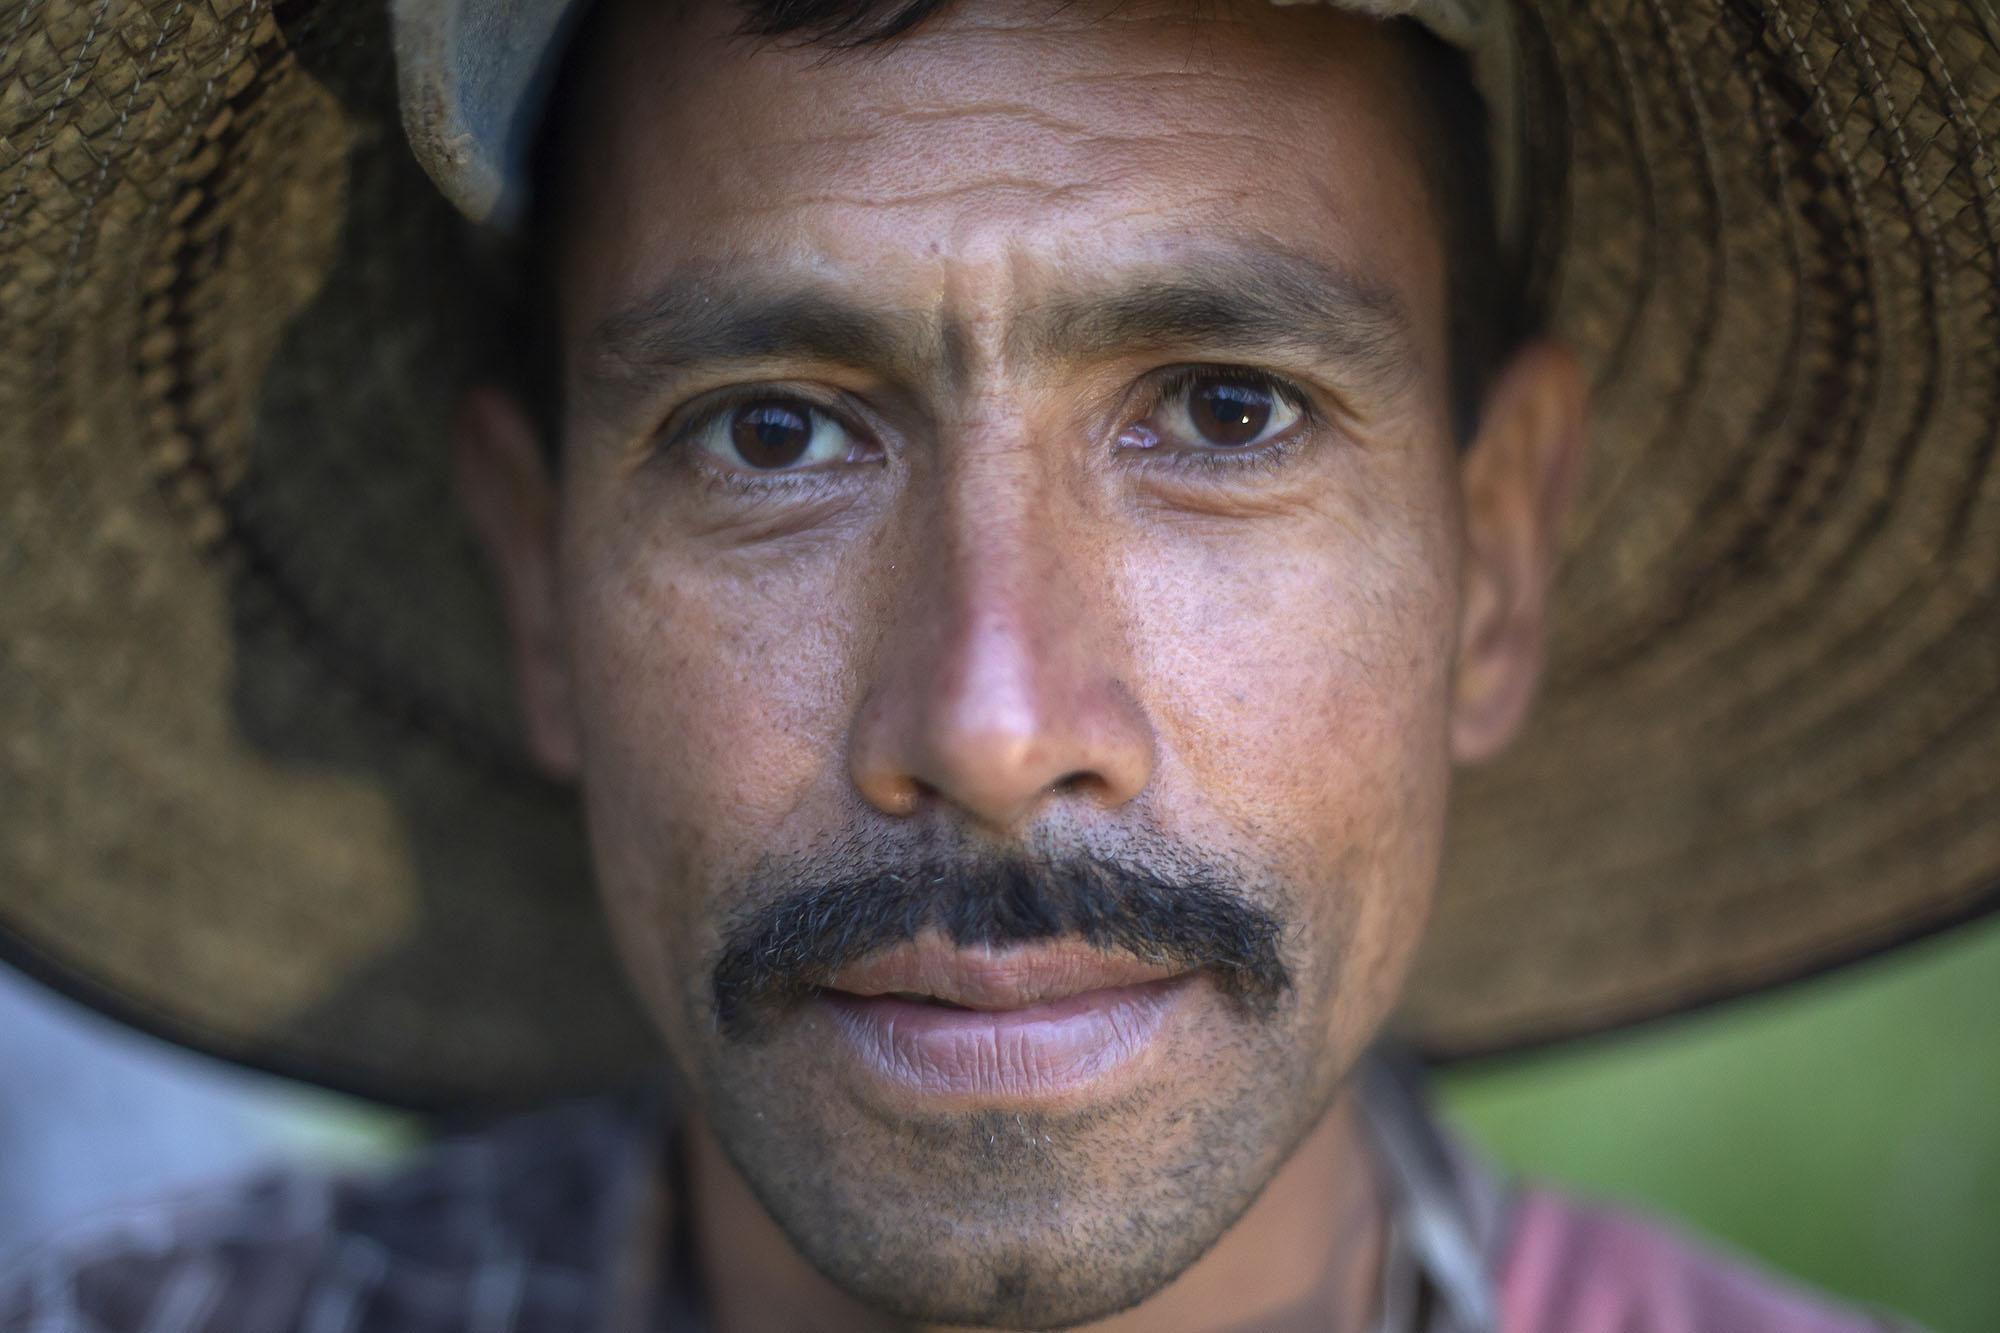 Art and Documentary Photography - Loading 2._Personas_William_Pinilla_03.jpg